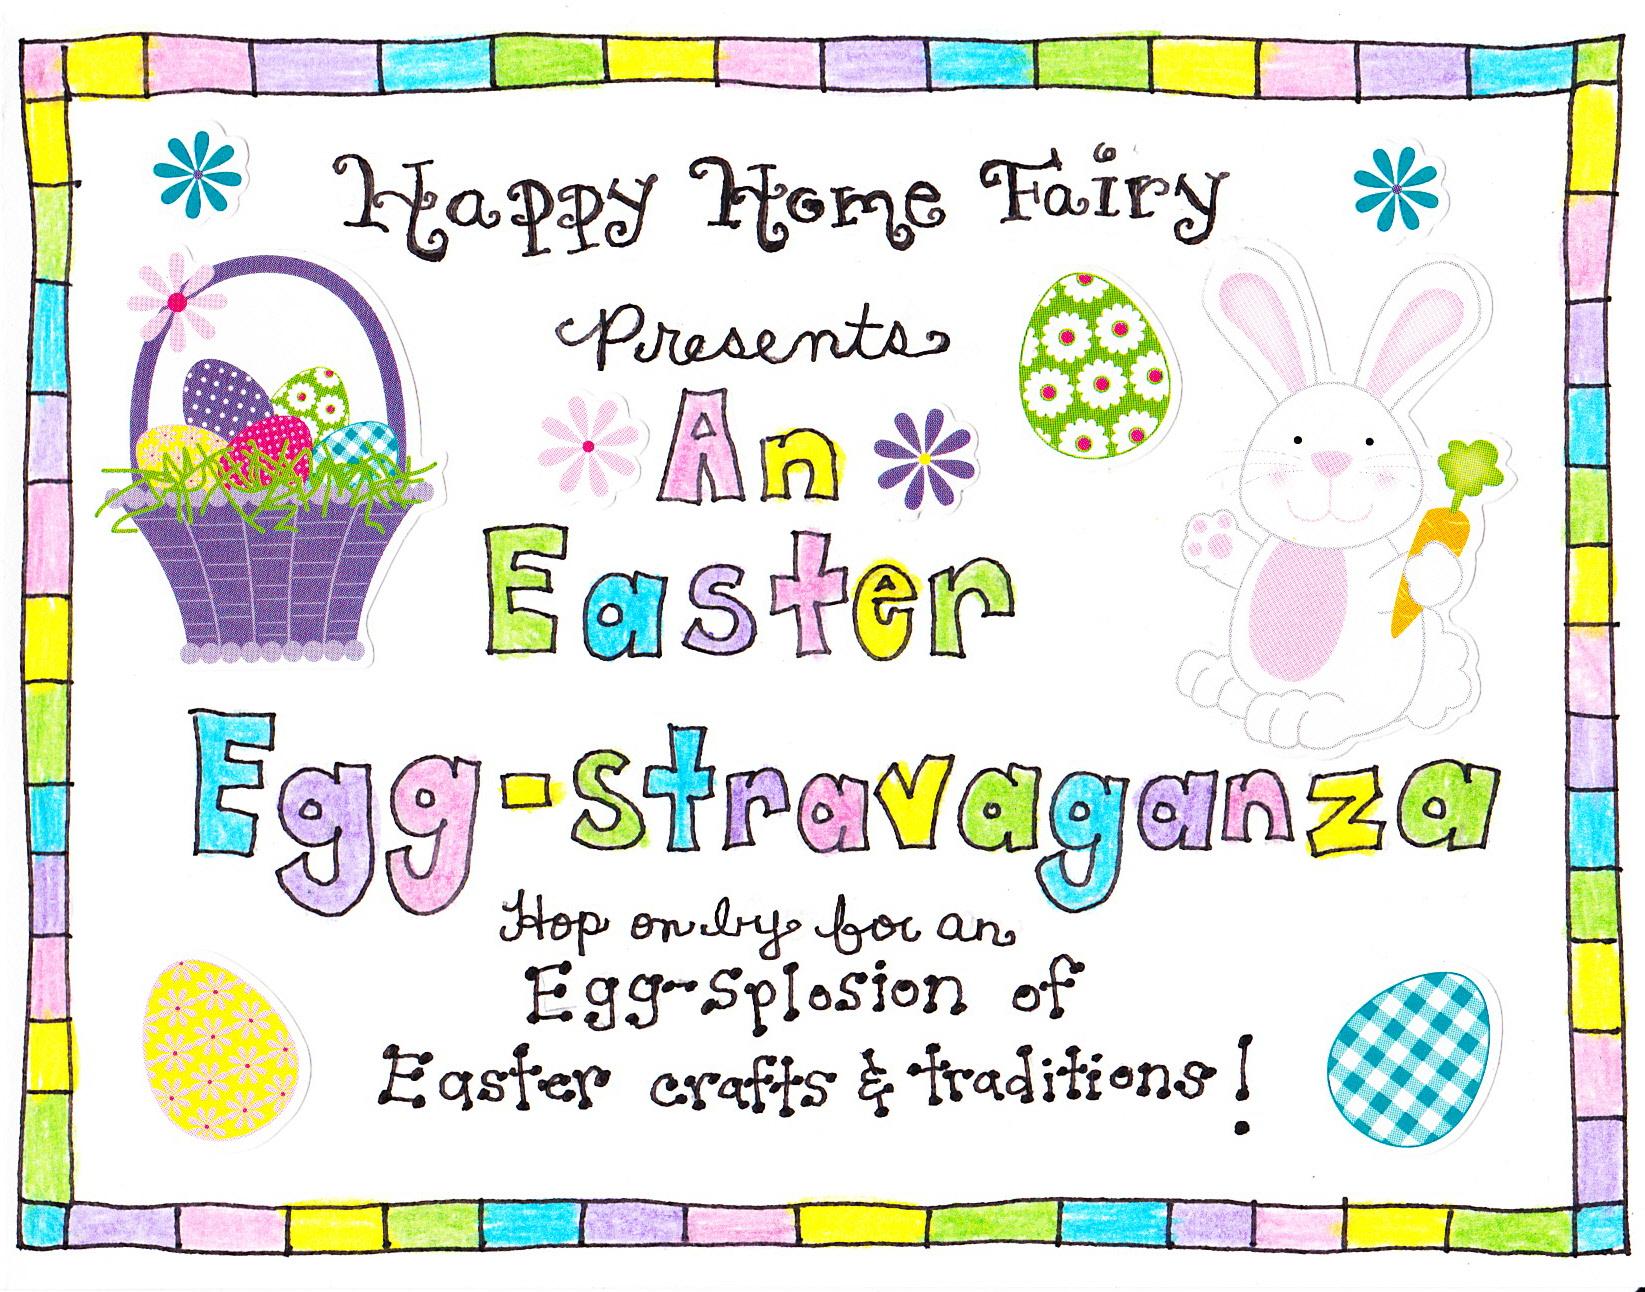 photograph relating to Resurrection Egg Story Printable titled Resurrection Eggs - Pleased Residence Fairy